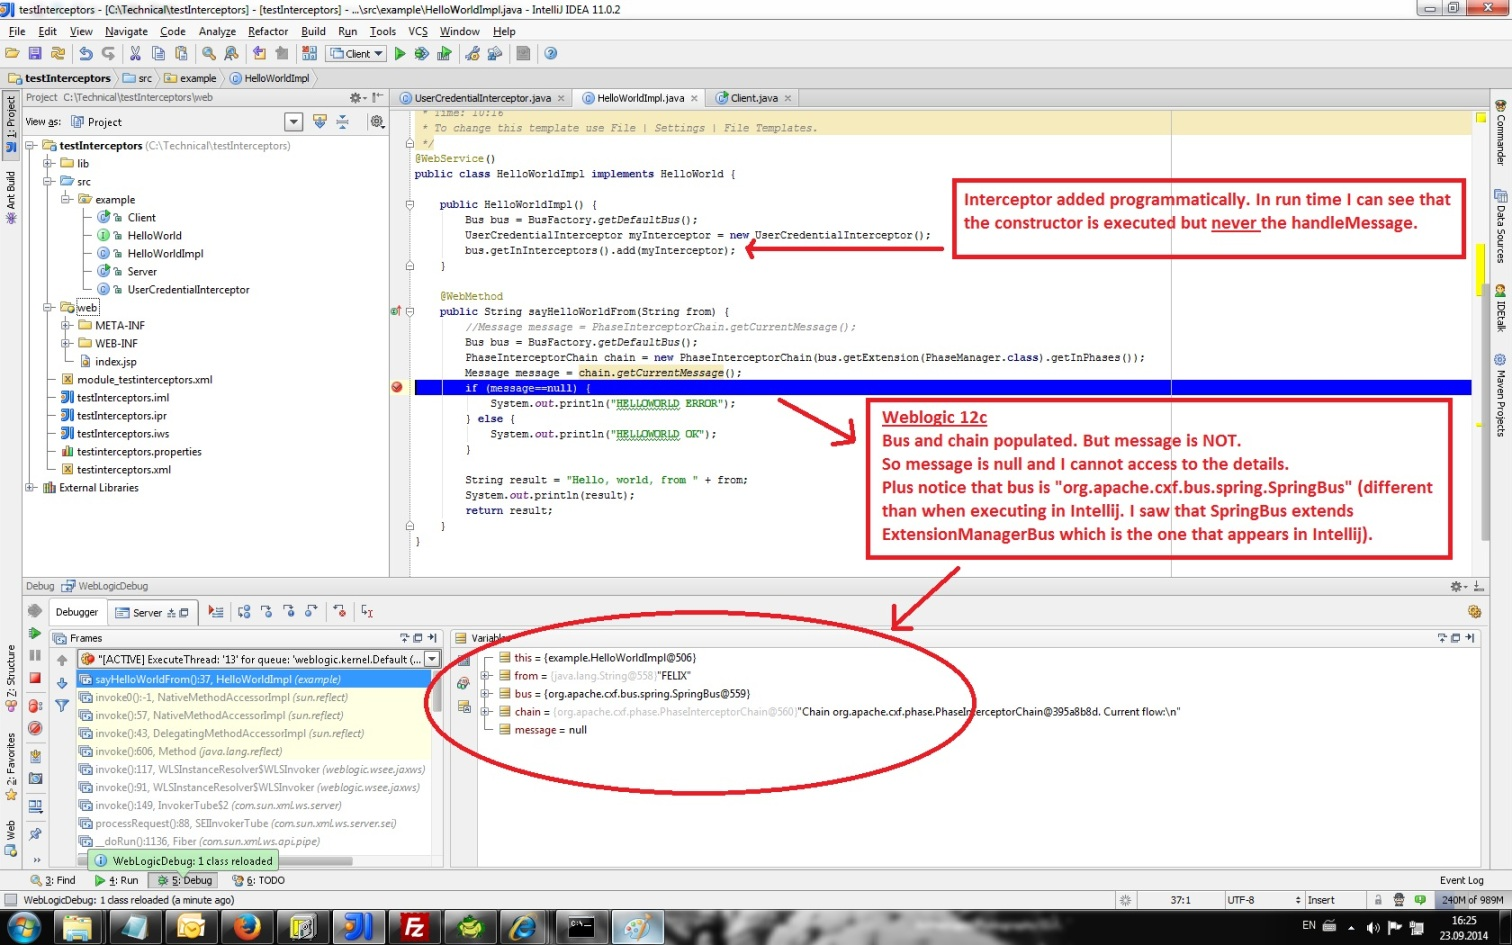 Apache CXF interceptors not triggered in WebLogic 12c ? (Web